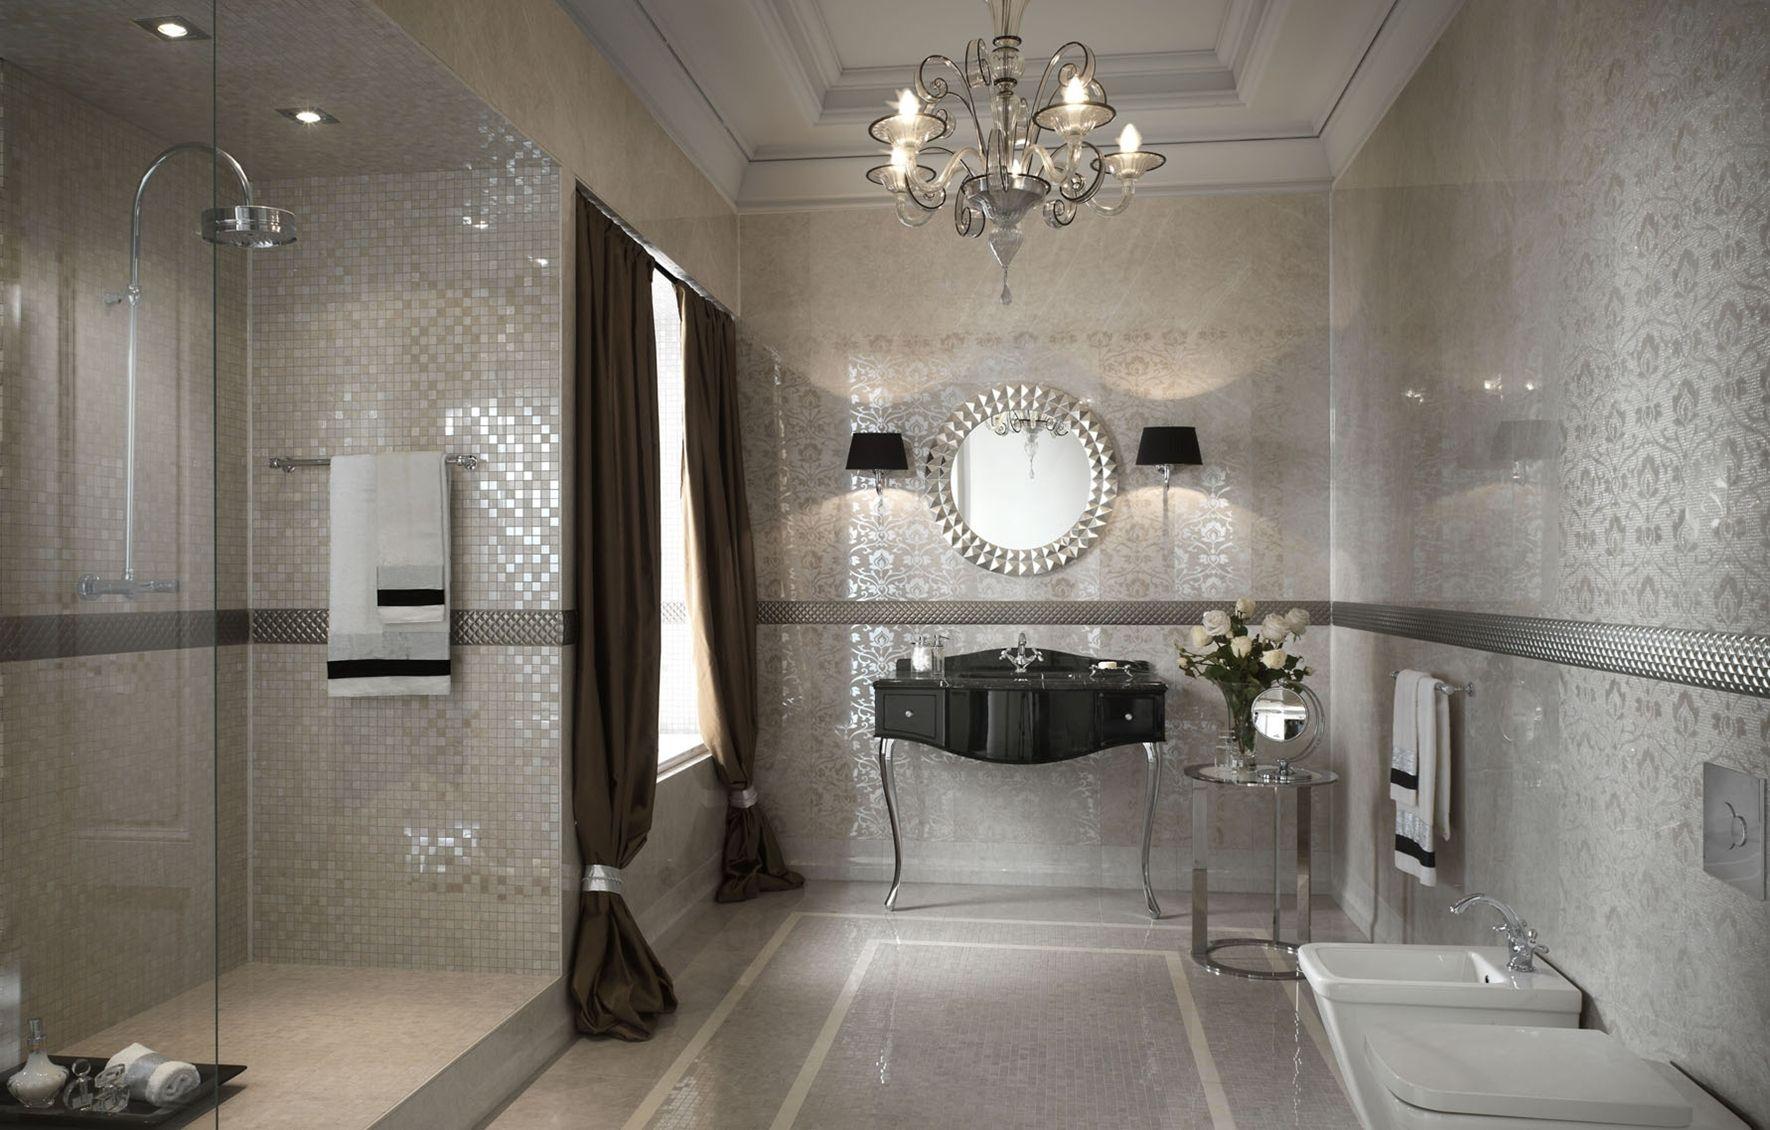 Bagno mosaico nero cool piastrelle mosaico bagno cucina wc